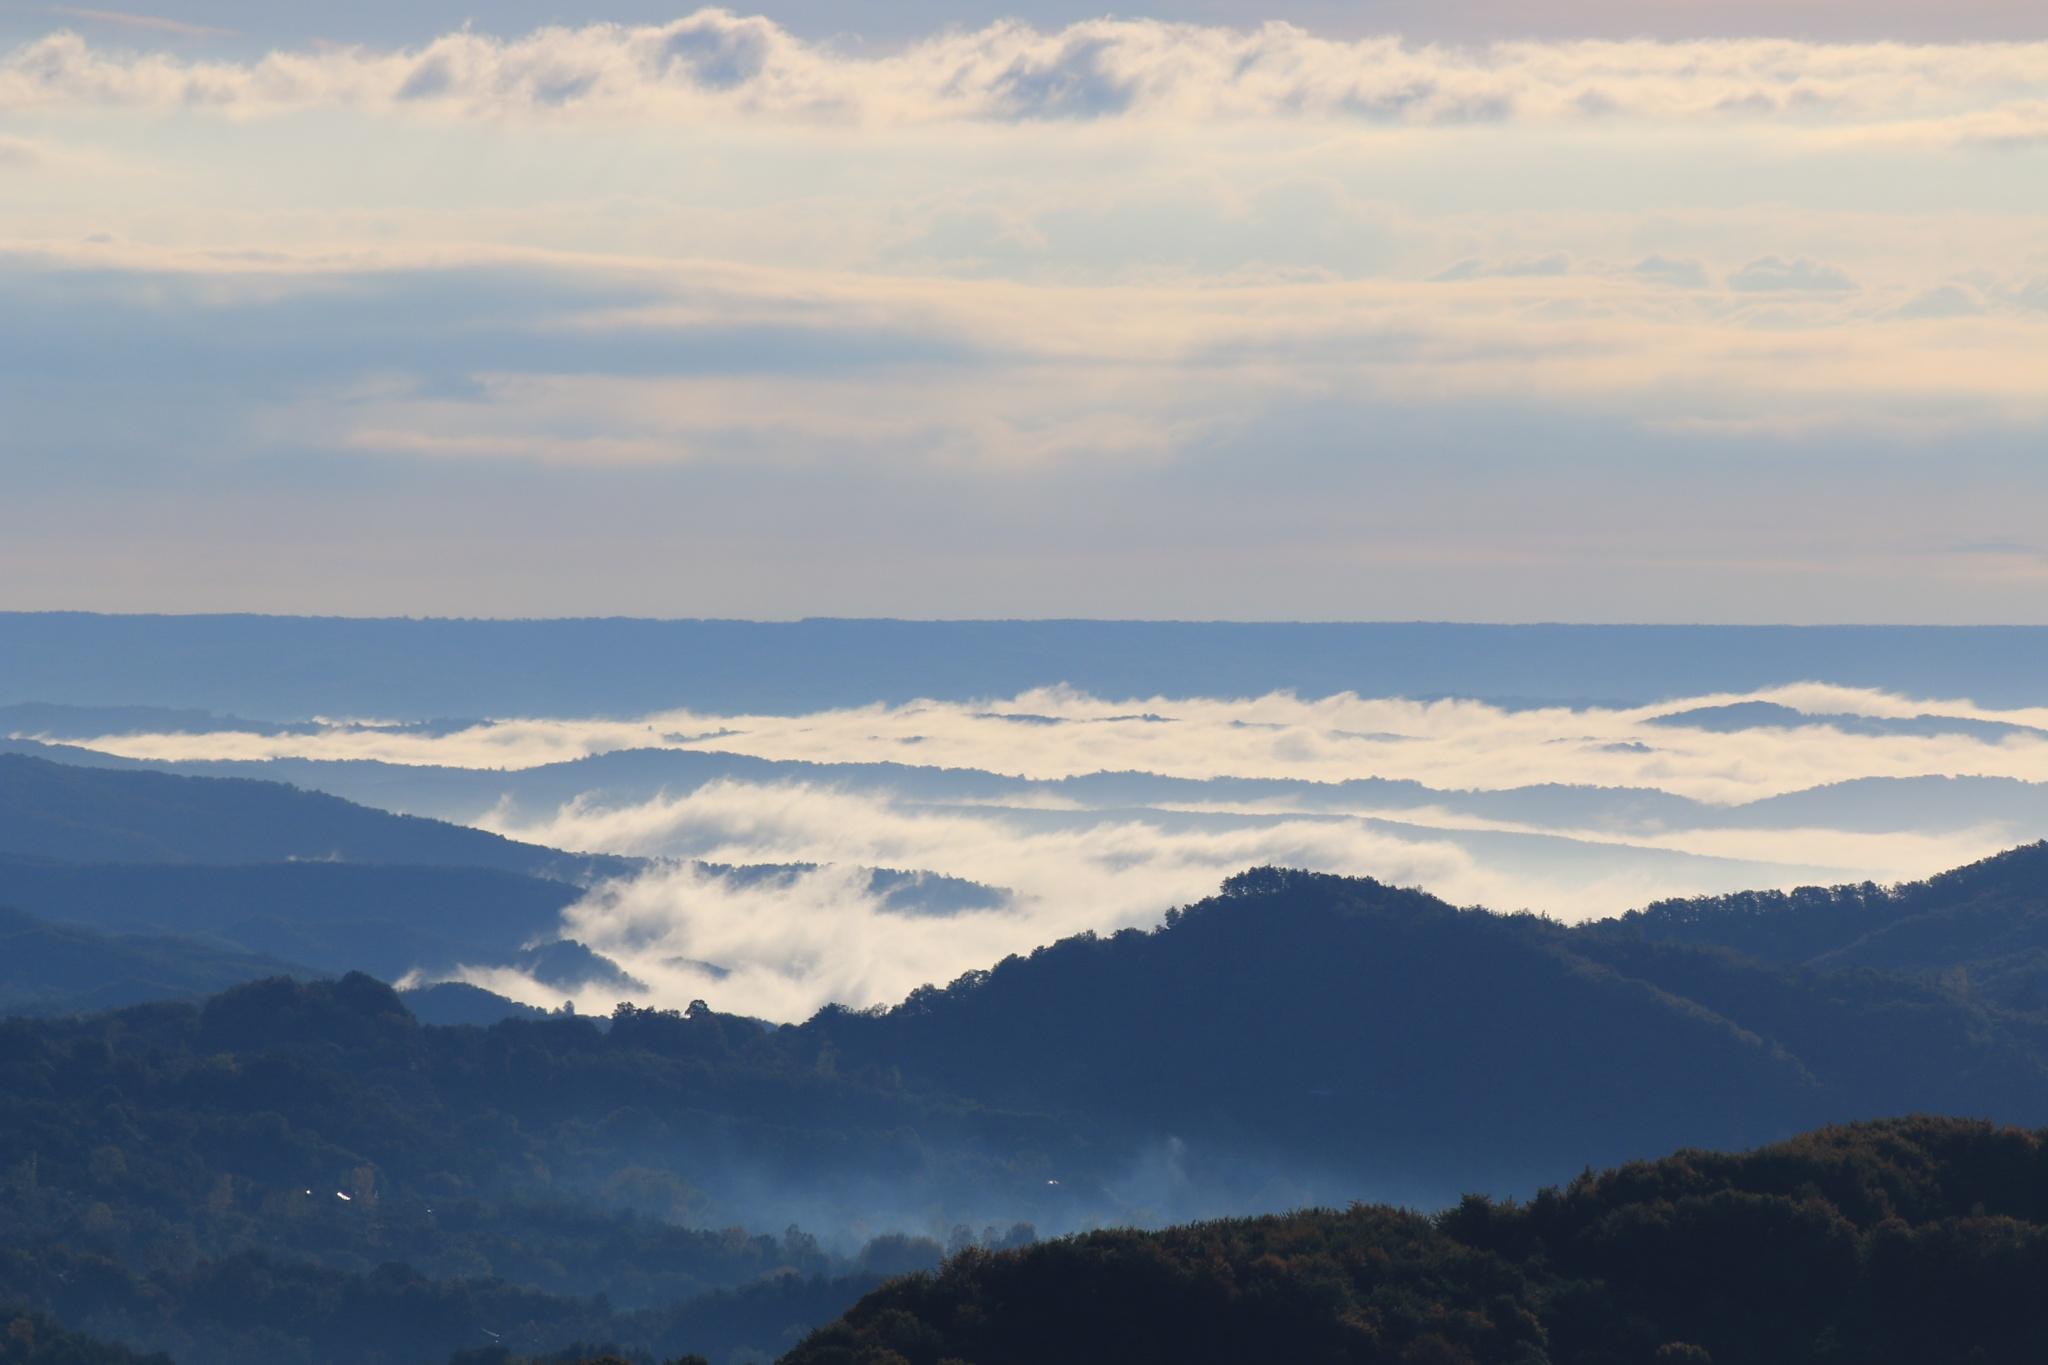 carpathians mountains at arnota by mihai muraretu